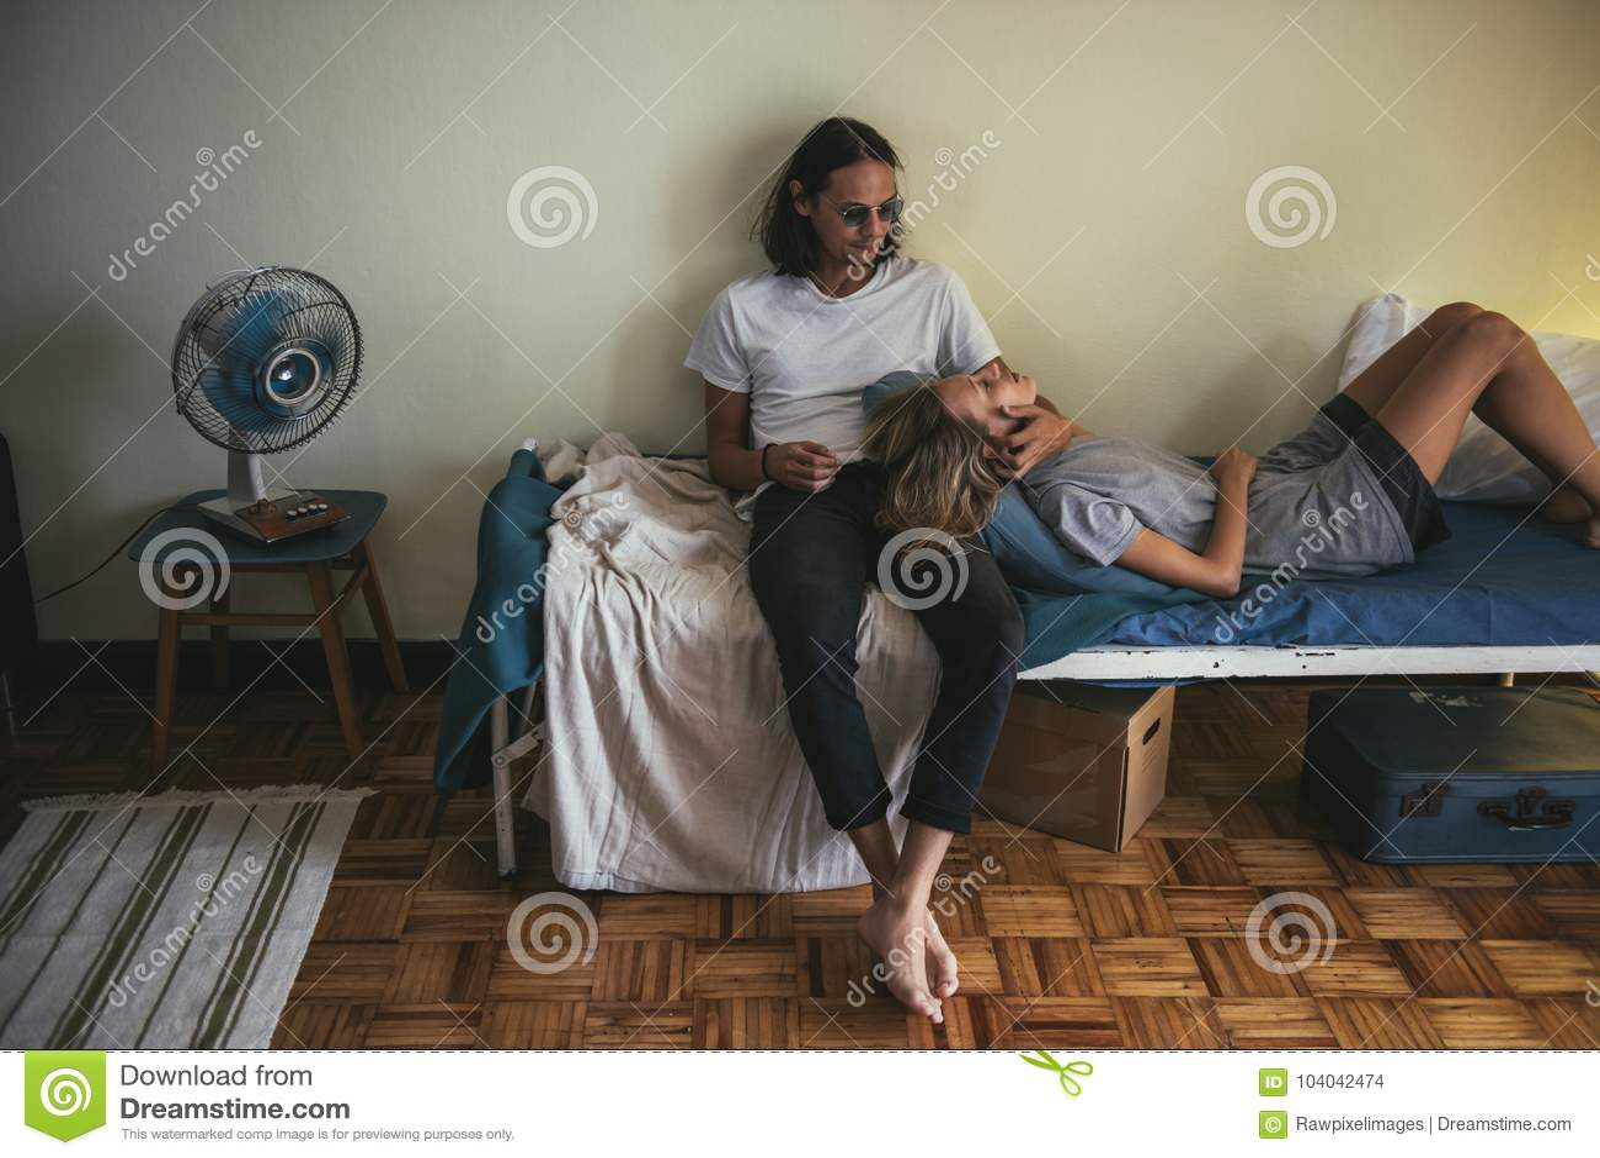 секс пара муж досуг москва жизни великолепно спустил